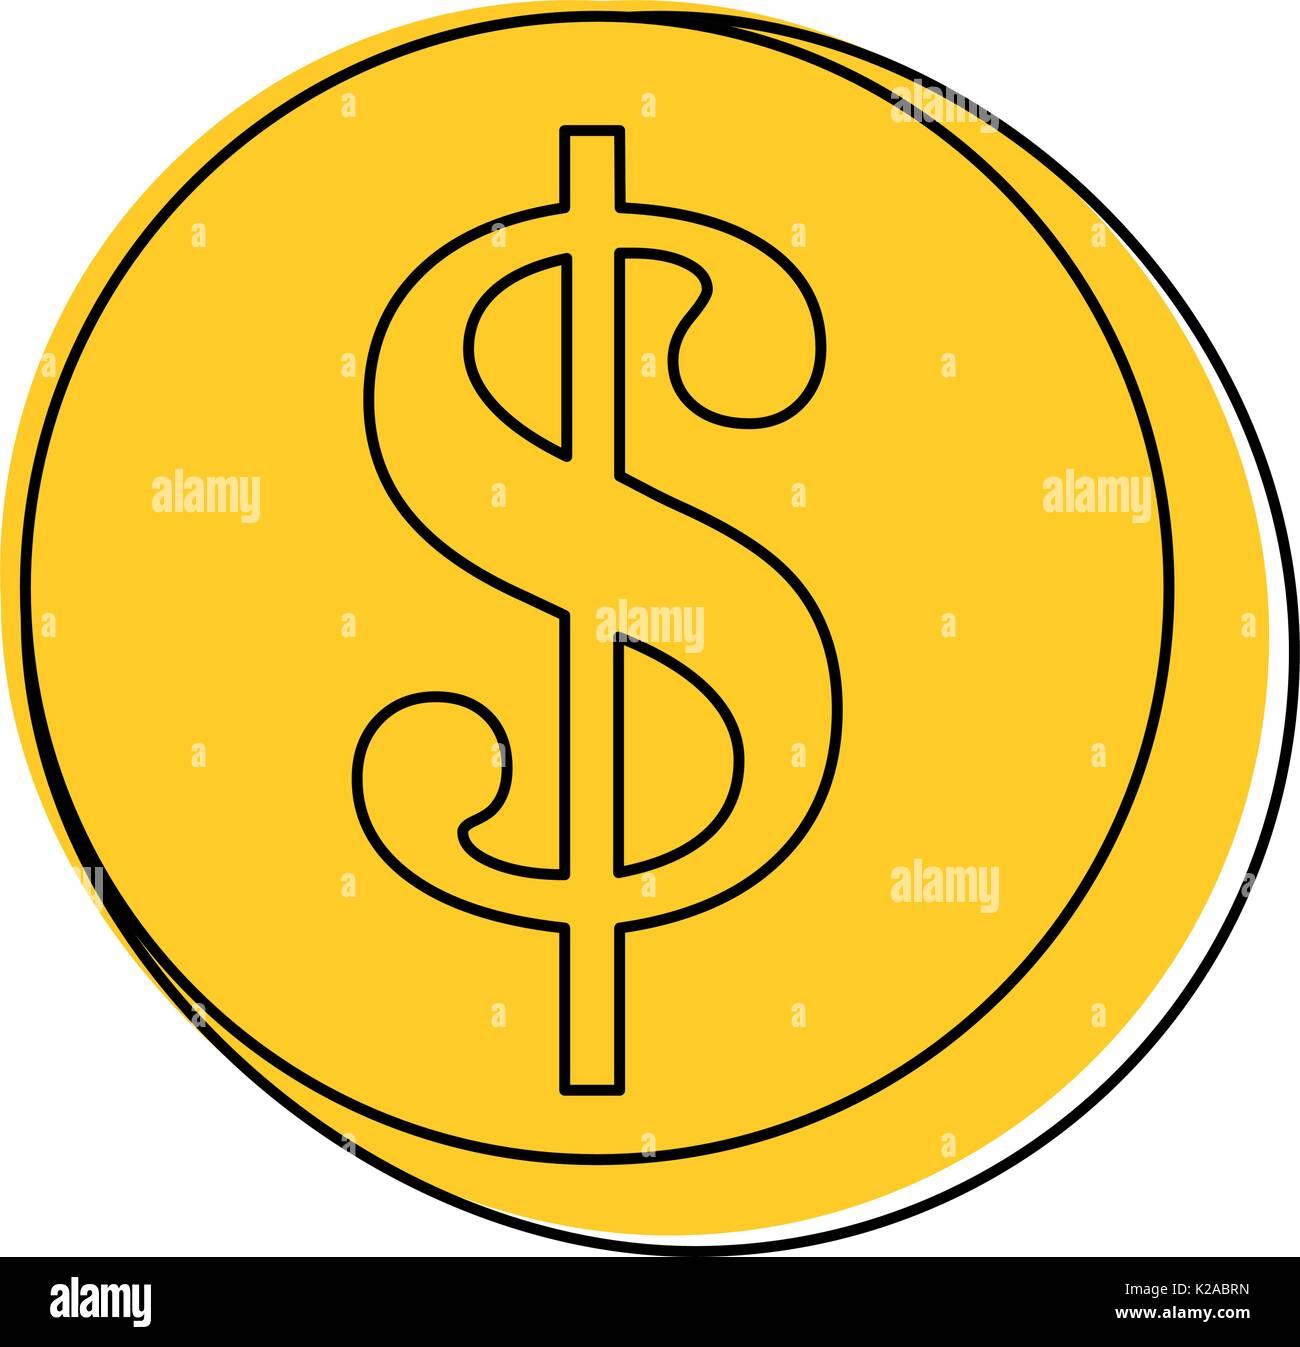 money coin icon - Stock Image